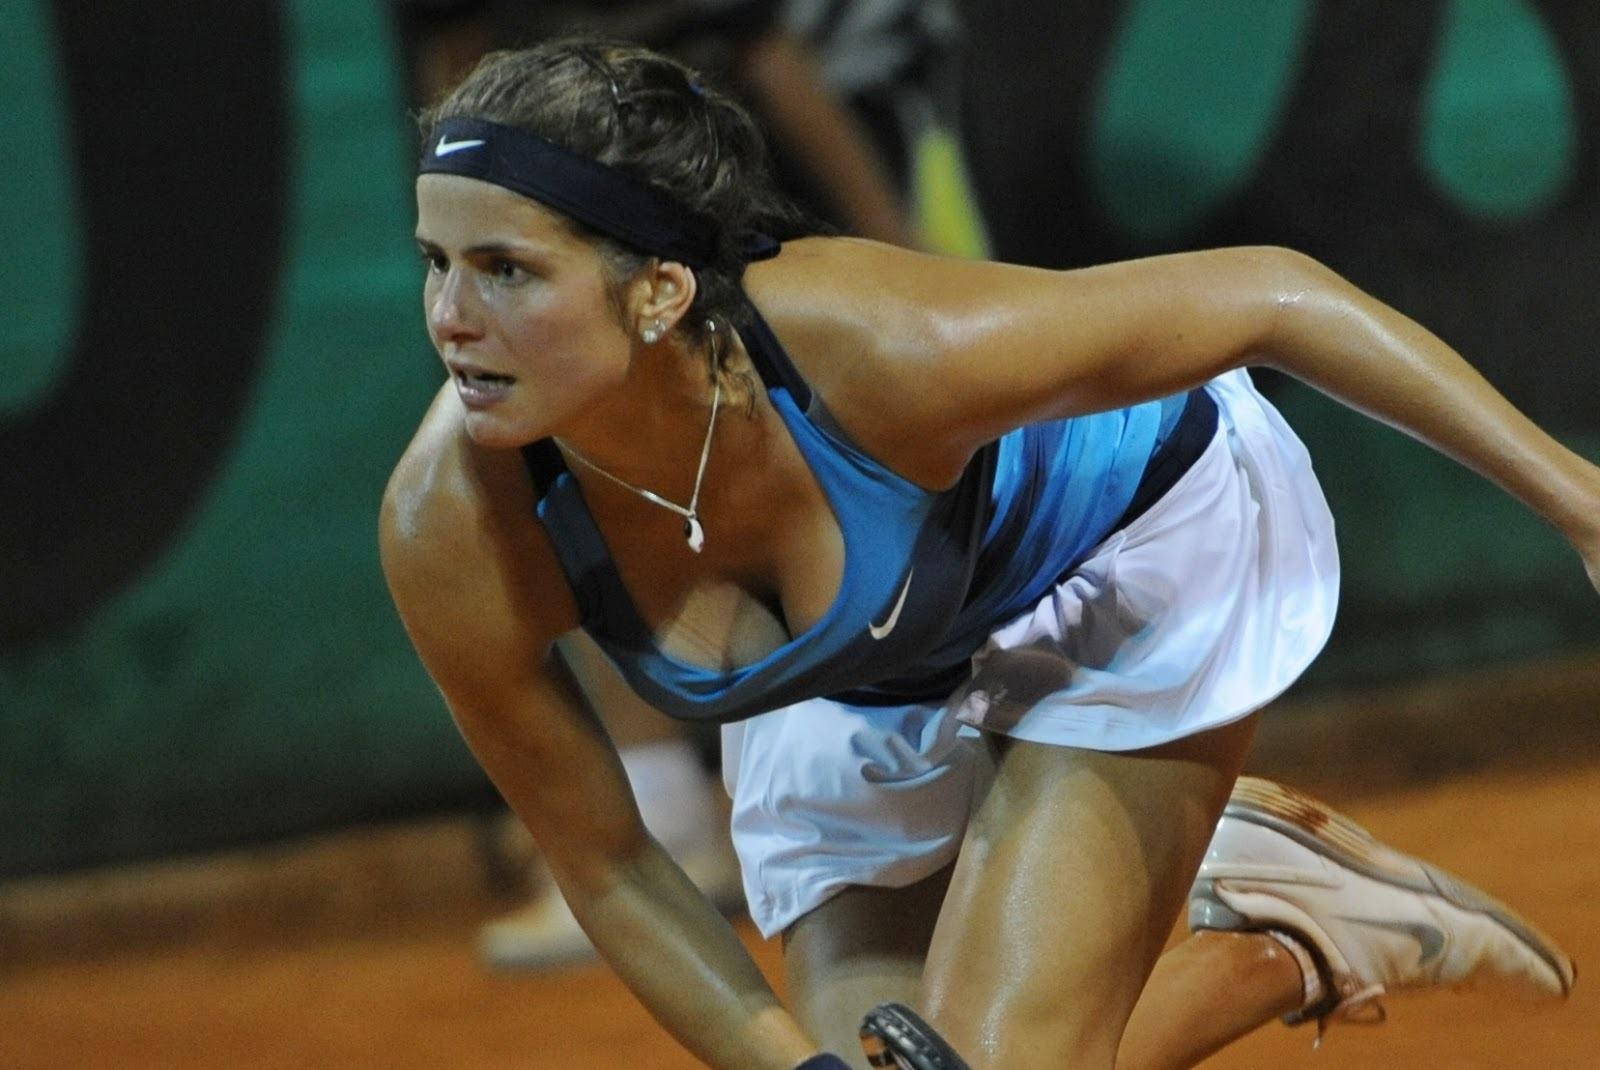 Beautiful tennis players nude